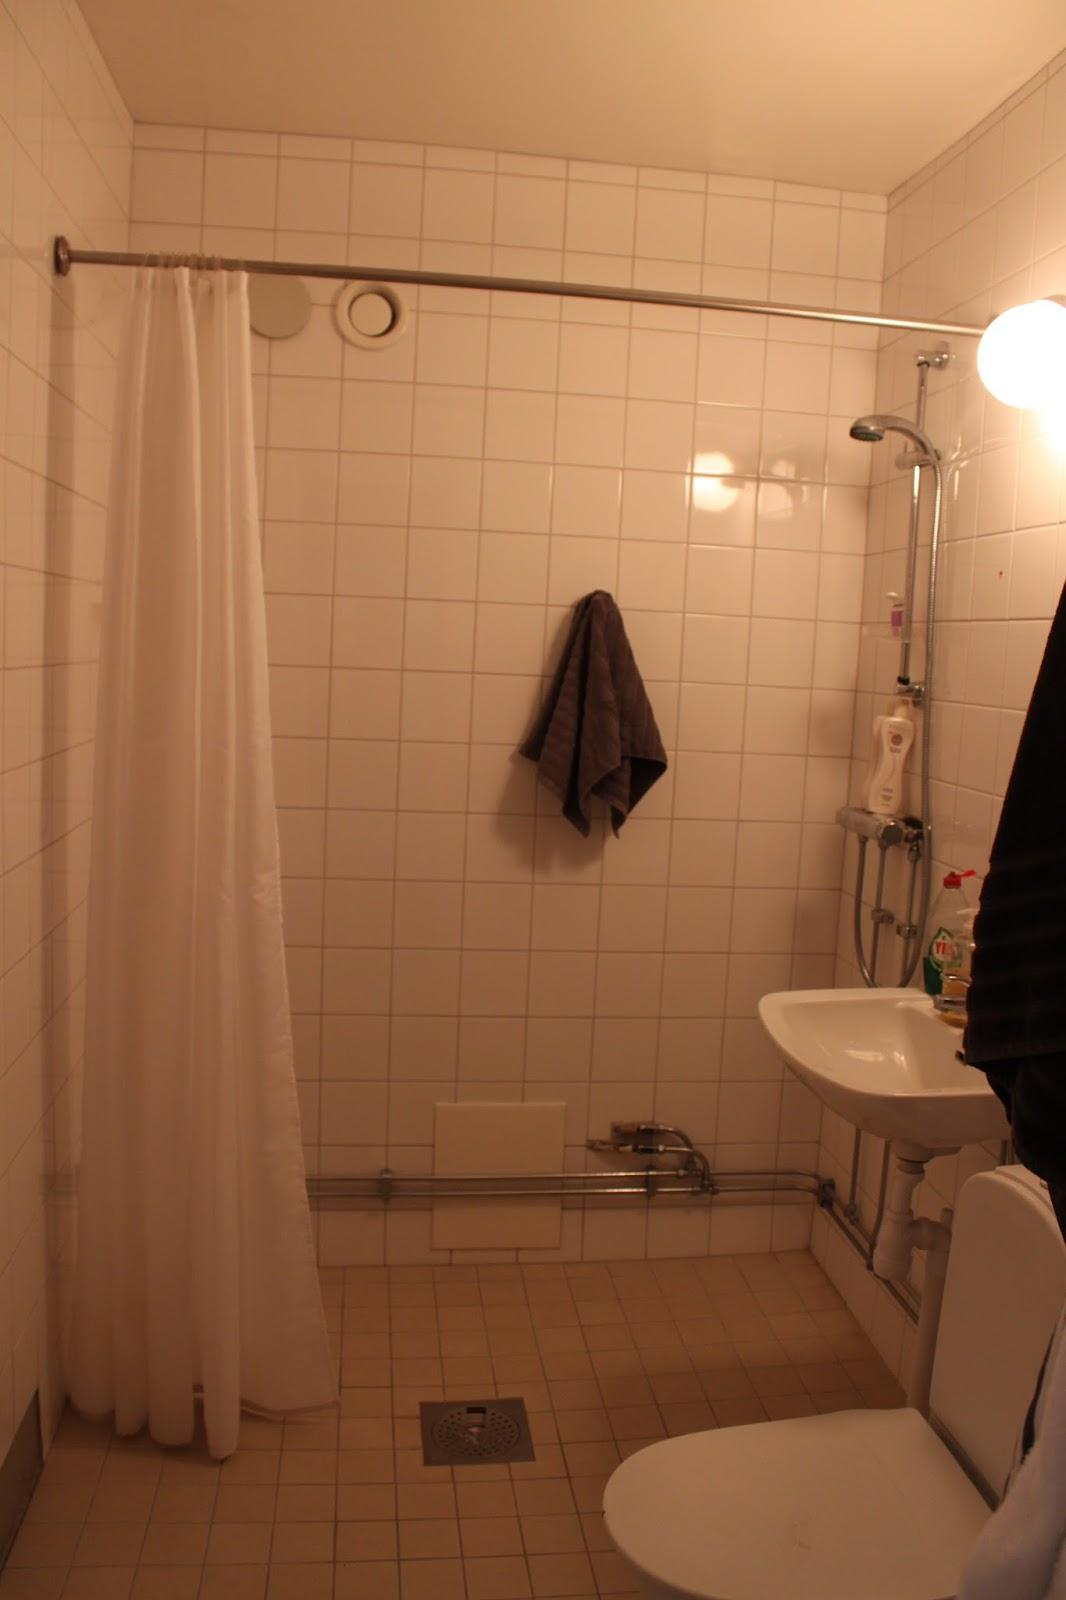 Släng dig i väggen, ernst!: badrumsbeslutsångest de luxe